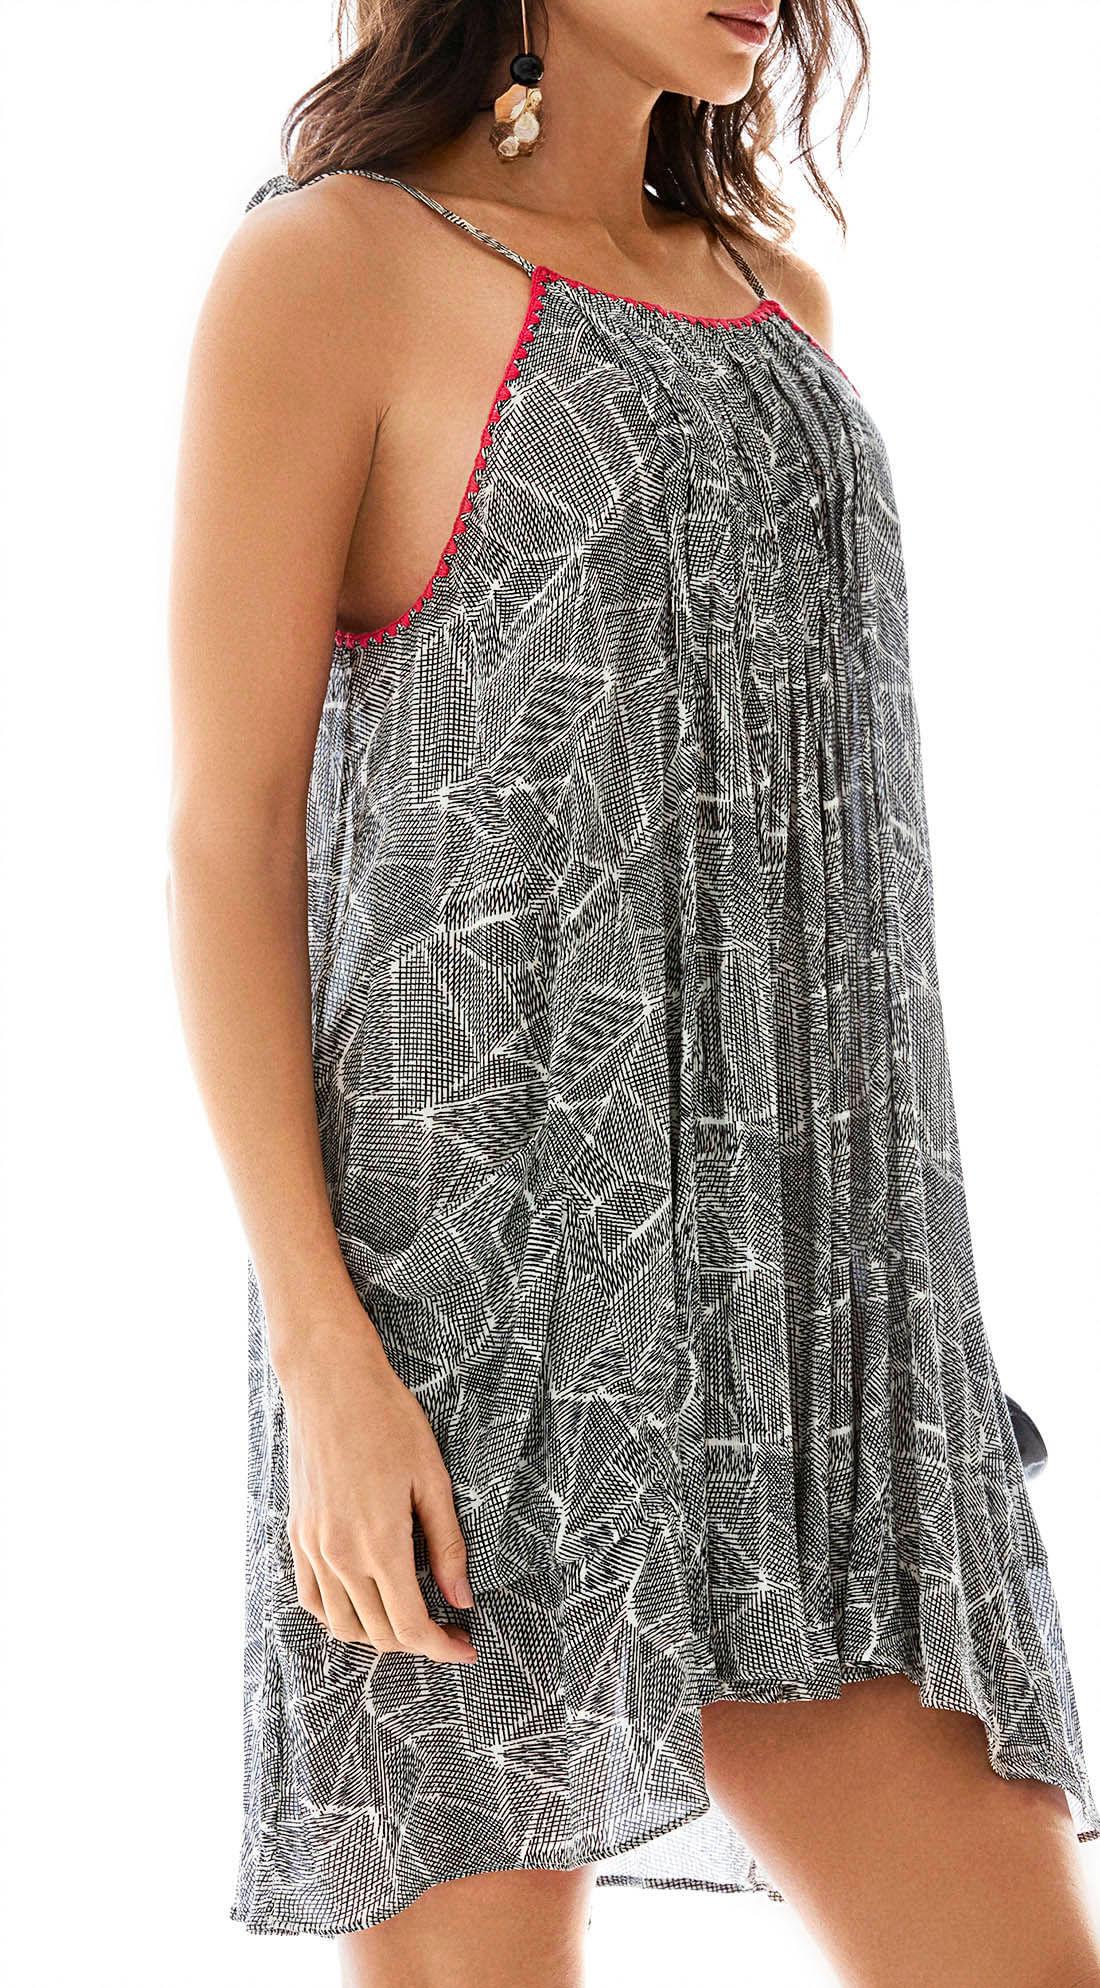 8b15b7730a98 Vestido Curto Decote Redondo Detalhe Croche Preto - morenarosa